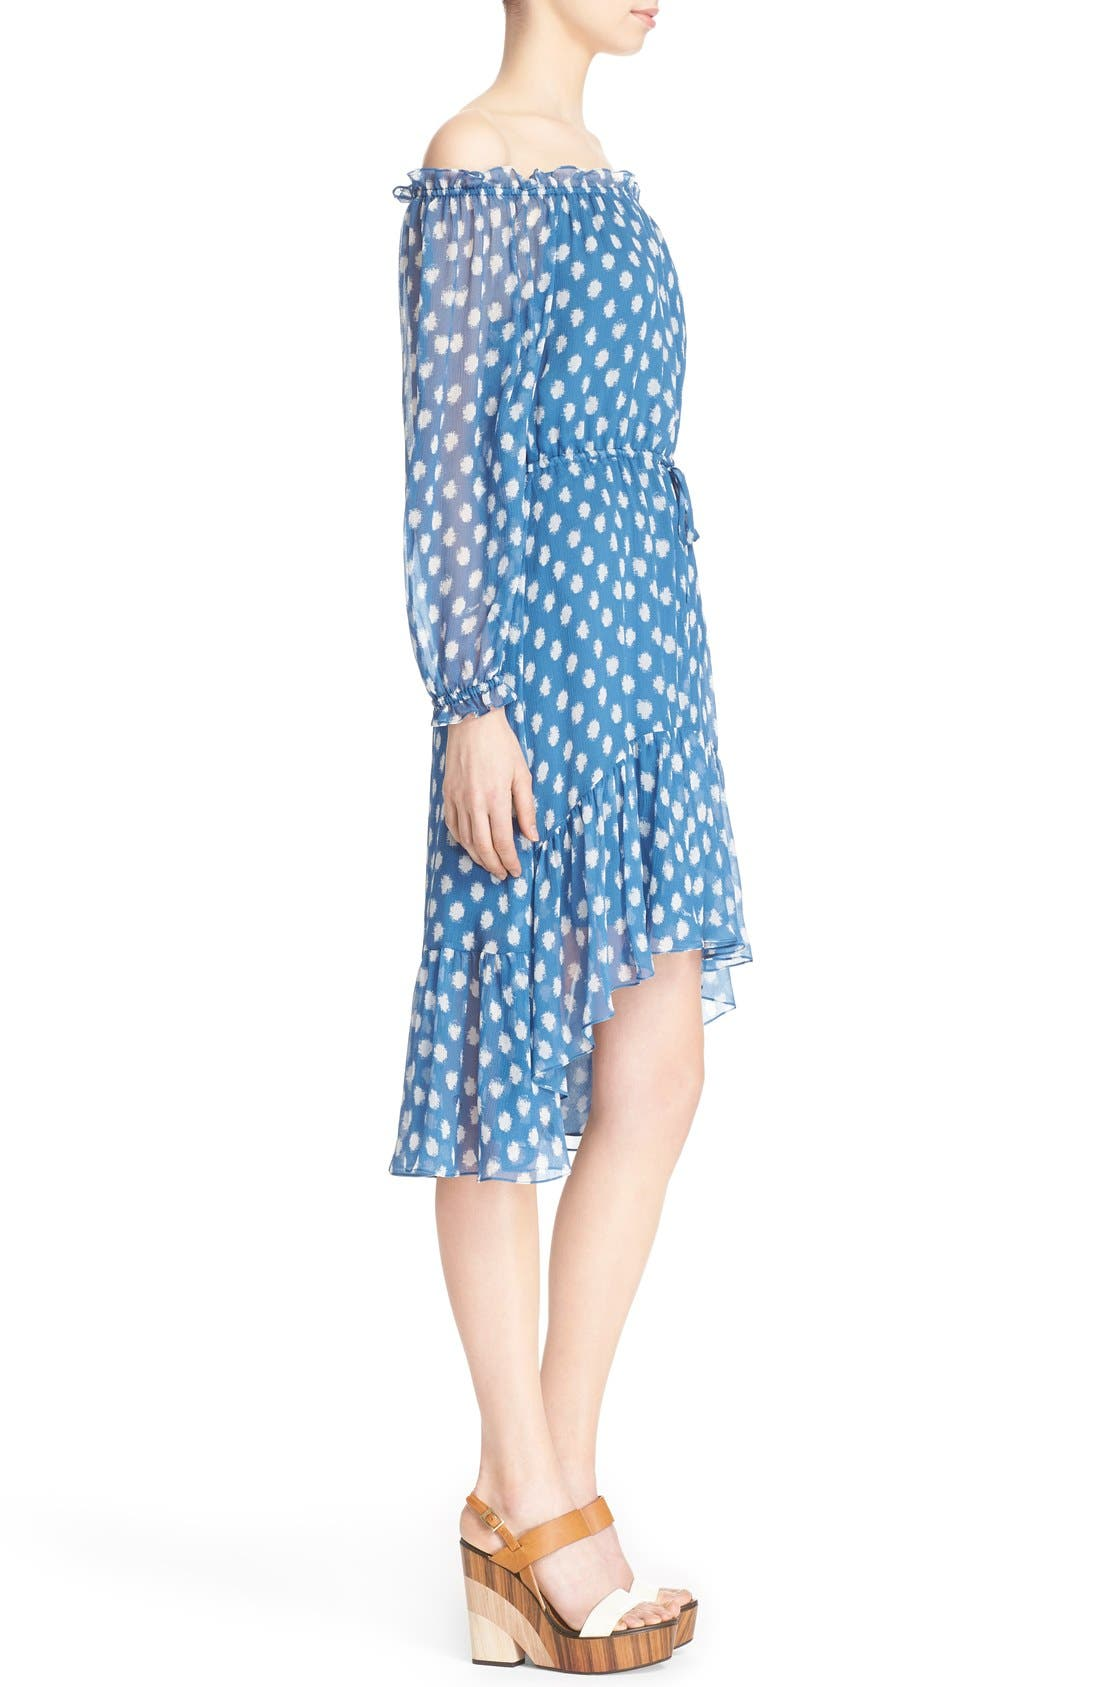 Alternate Image 3  - Diane von Furstenberg 'Camila Two' Off the Shoulder Polka Dot Silk Dress